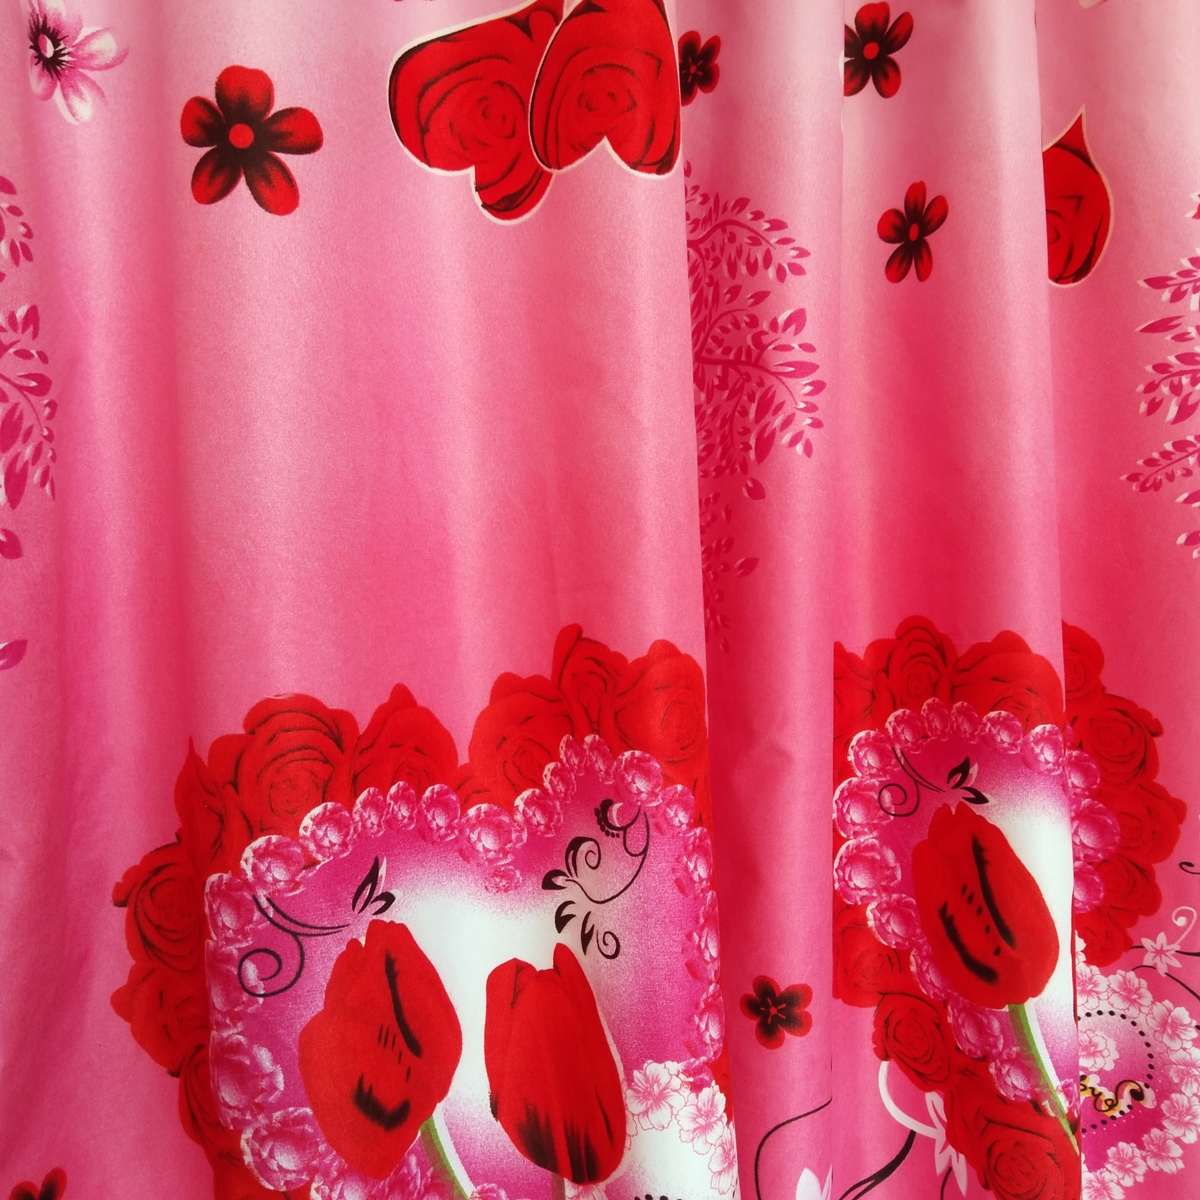 Gorden Pintu Rumah Motif Dhanista Model Smokring 12 Ring Ukuran Panjang Murah Elegan